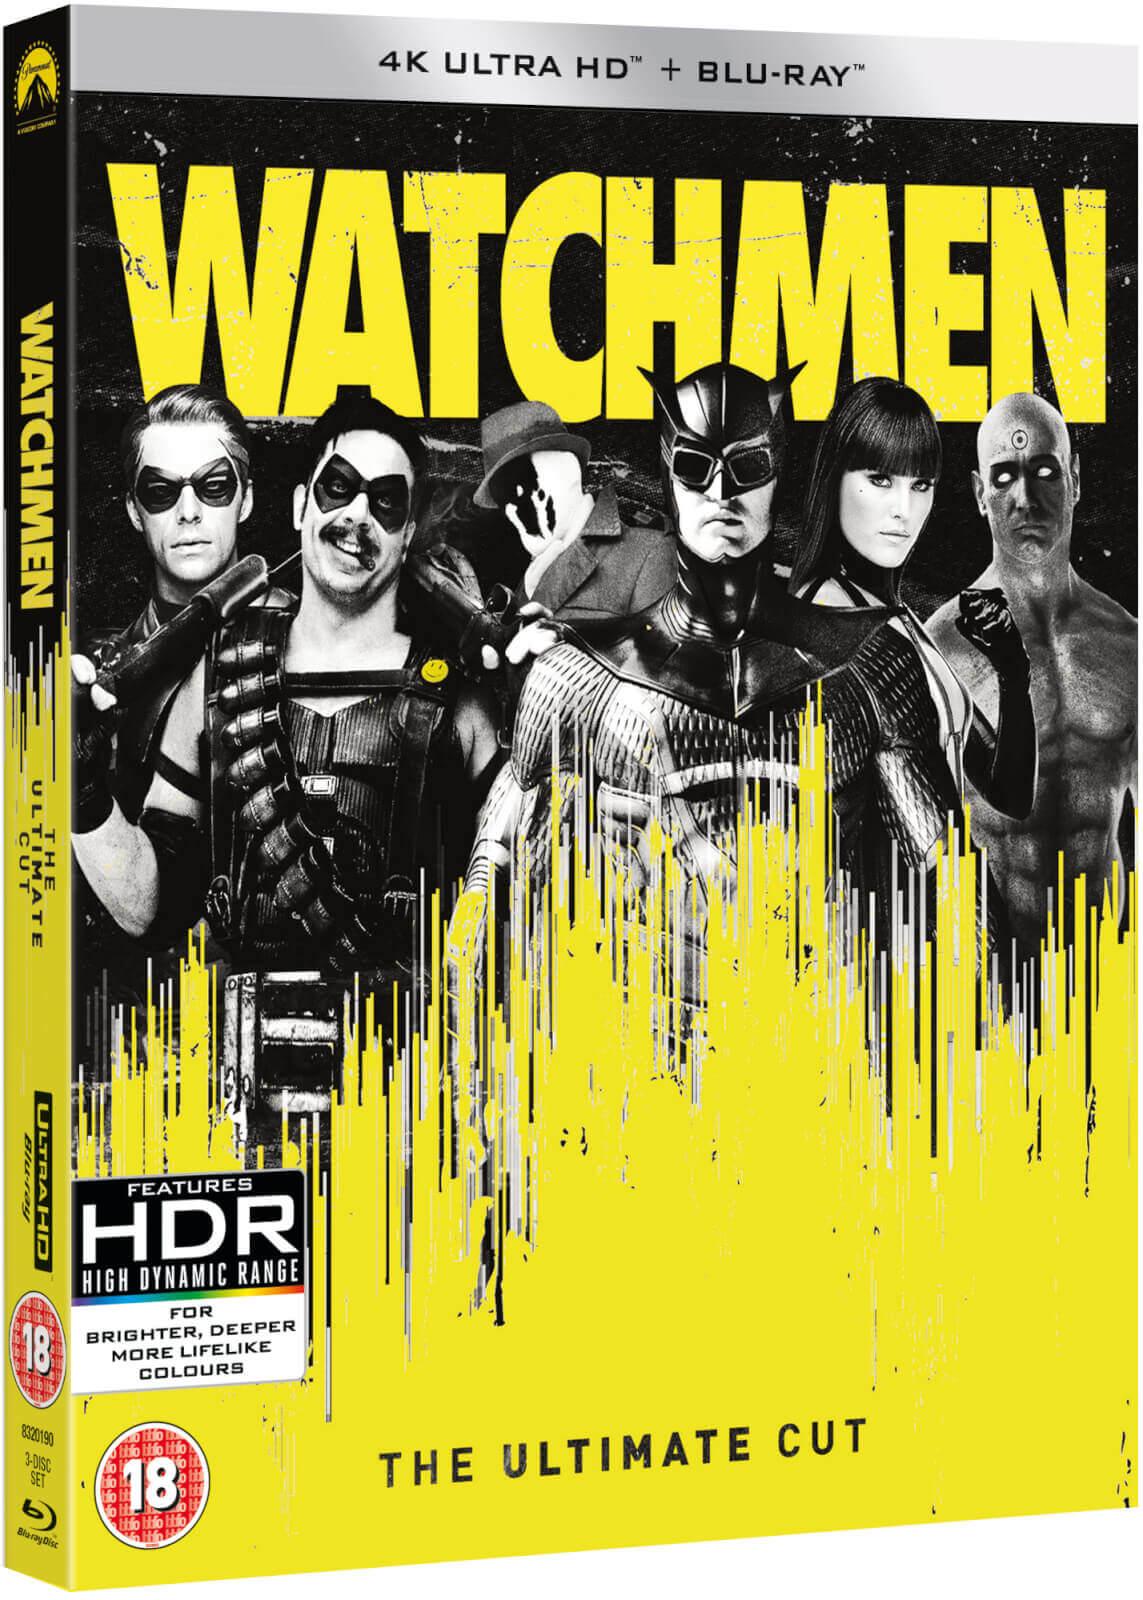 [Précommande] Coffret Blu-ray 4K UHD + Blu-ray Watchmen - Ultimate Cut Edition